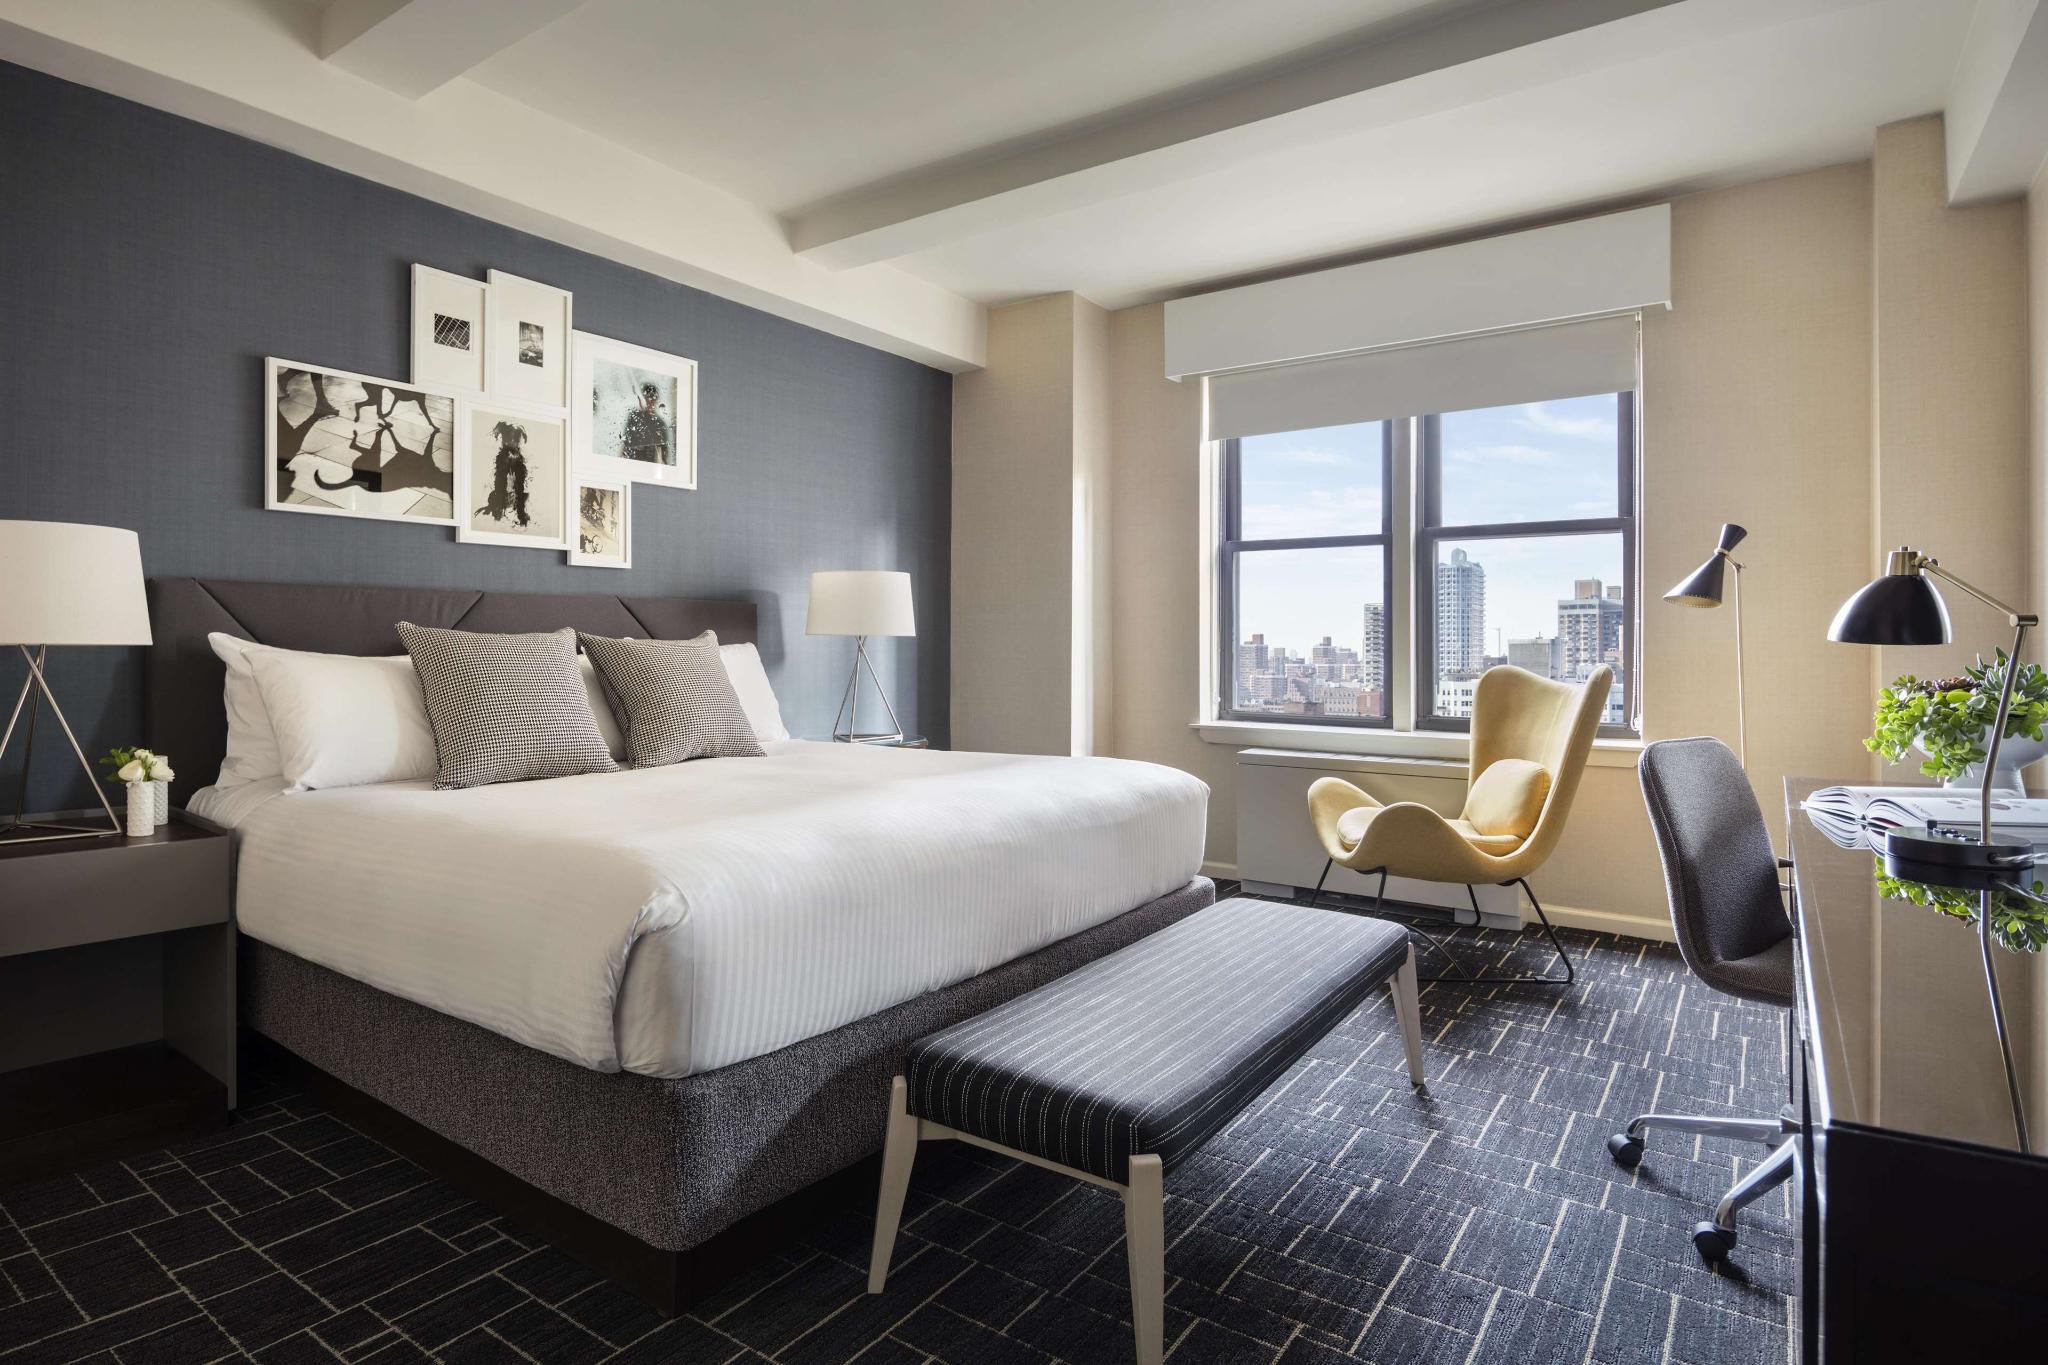 Room GUEST ROOM